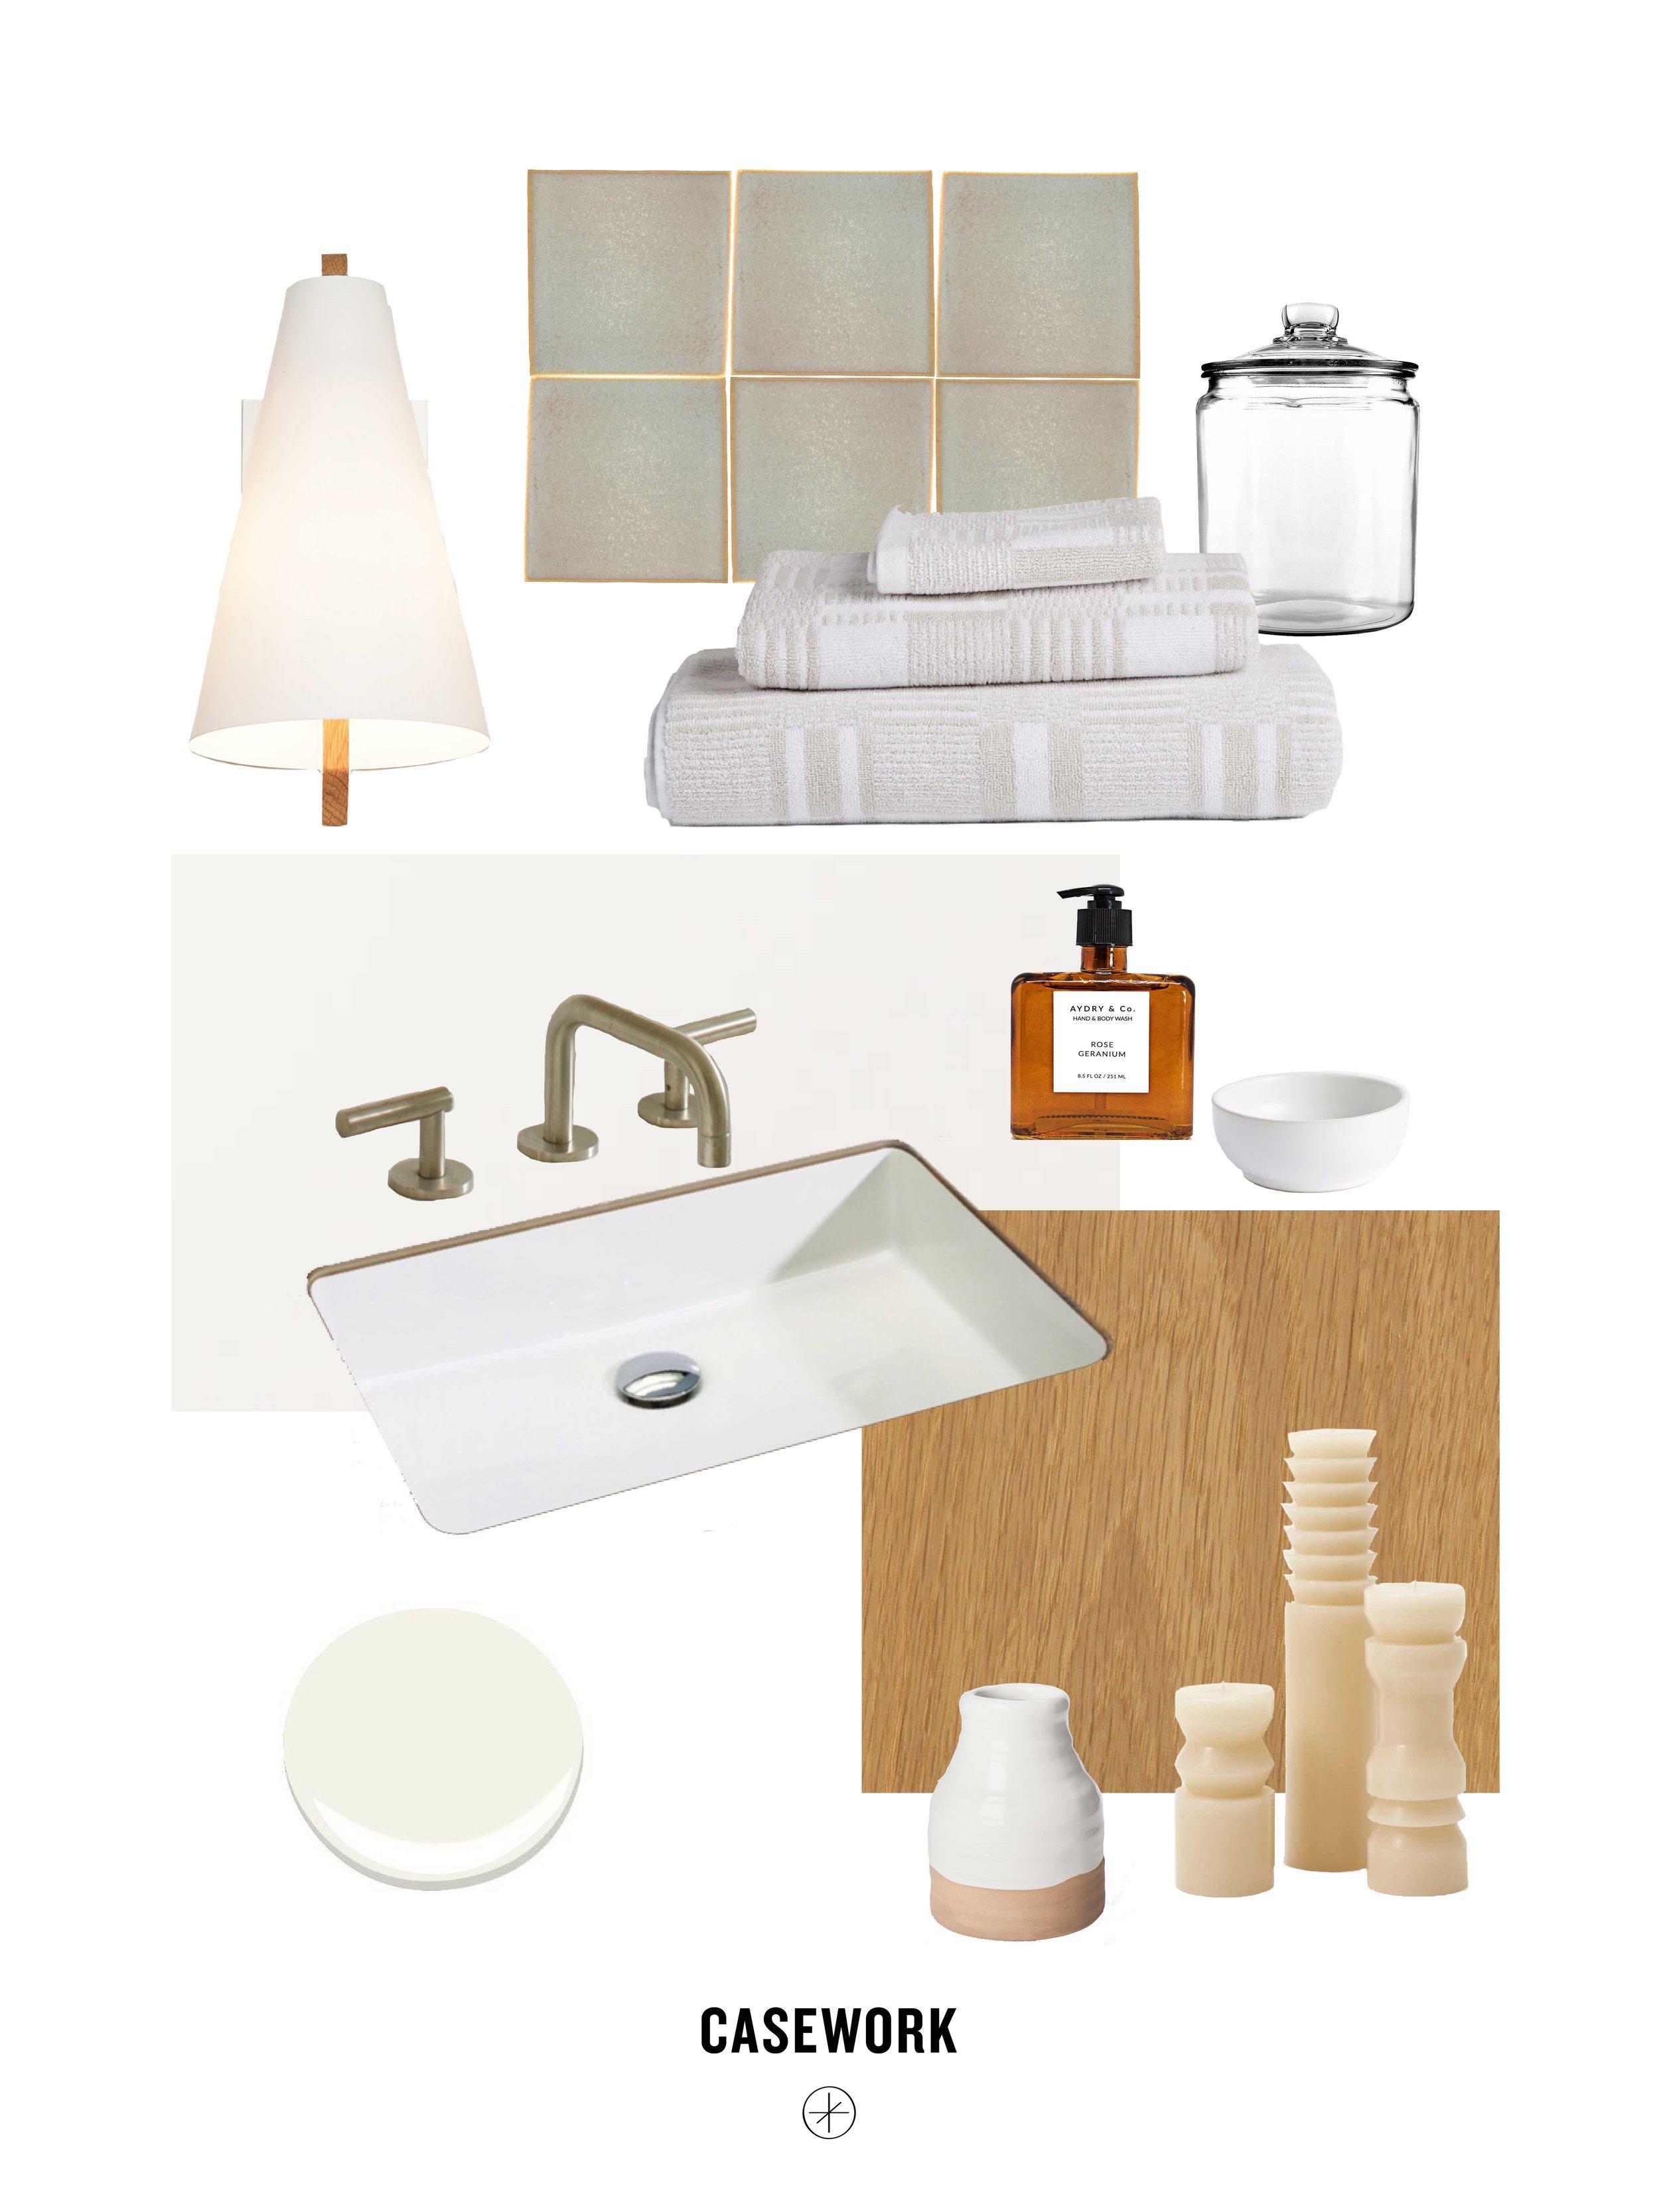 Sources:  Tub/Shower Tile     Bathtub    Sink     Faucet     Counter     White Oak Vanity and Mirrors - custom    Sconces     Bath Mats/Towels     Candles     Vase     Bath Salts Container  